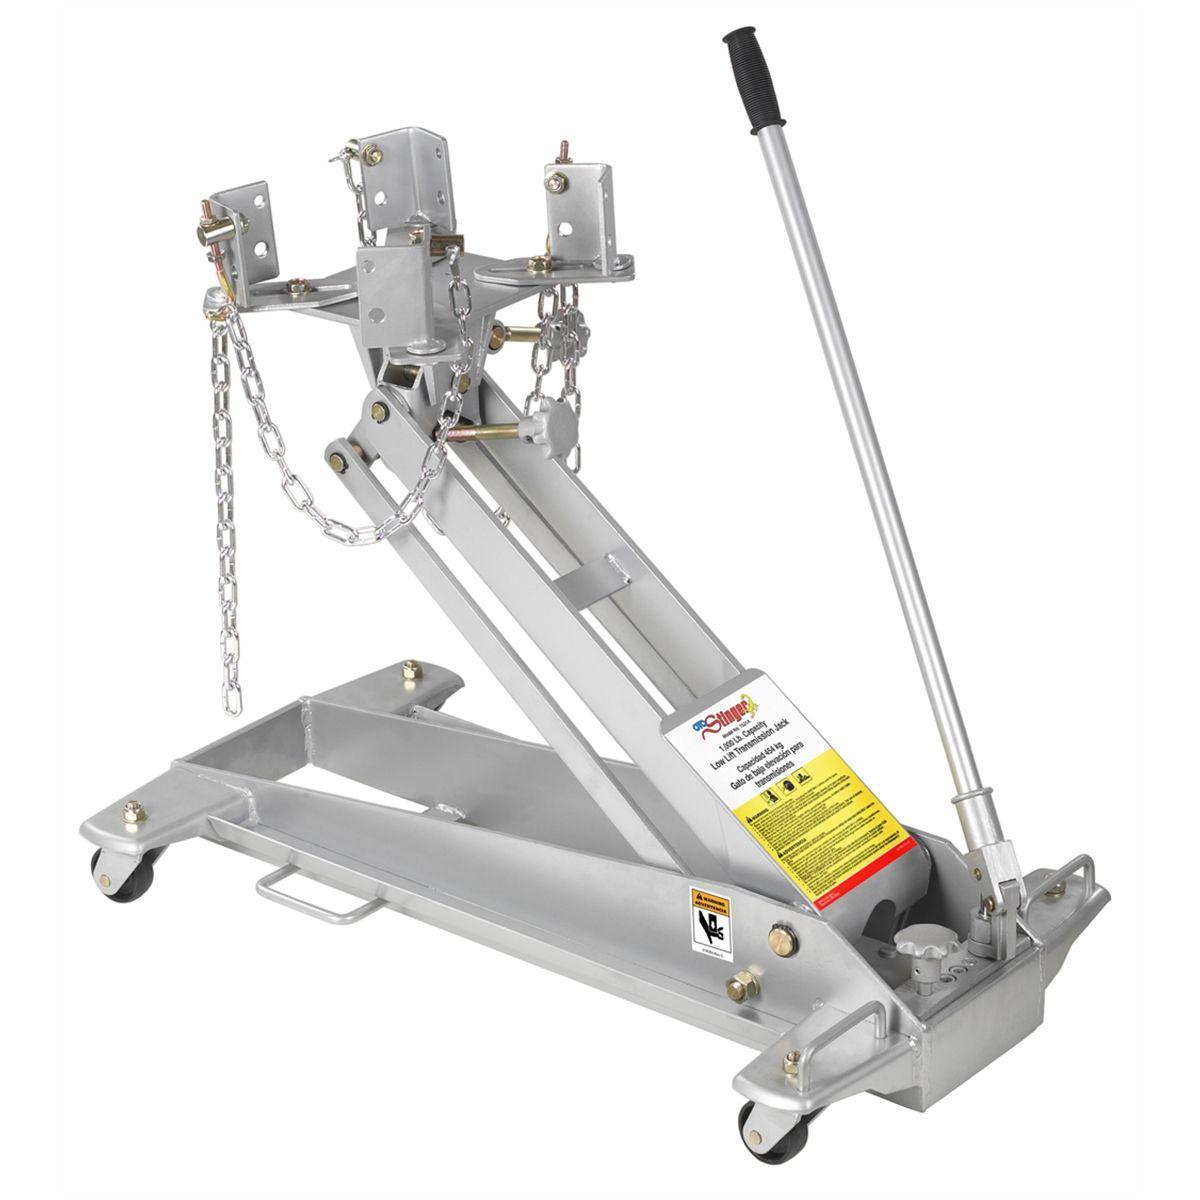 Otc 1521a 1 000 Lb Capacity Low Lift Transmission Jack